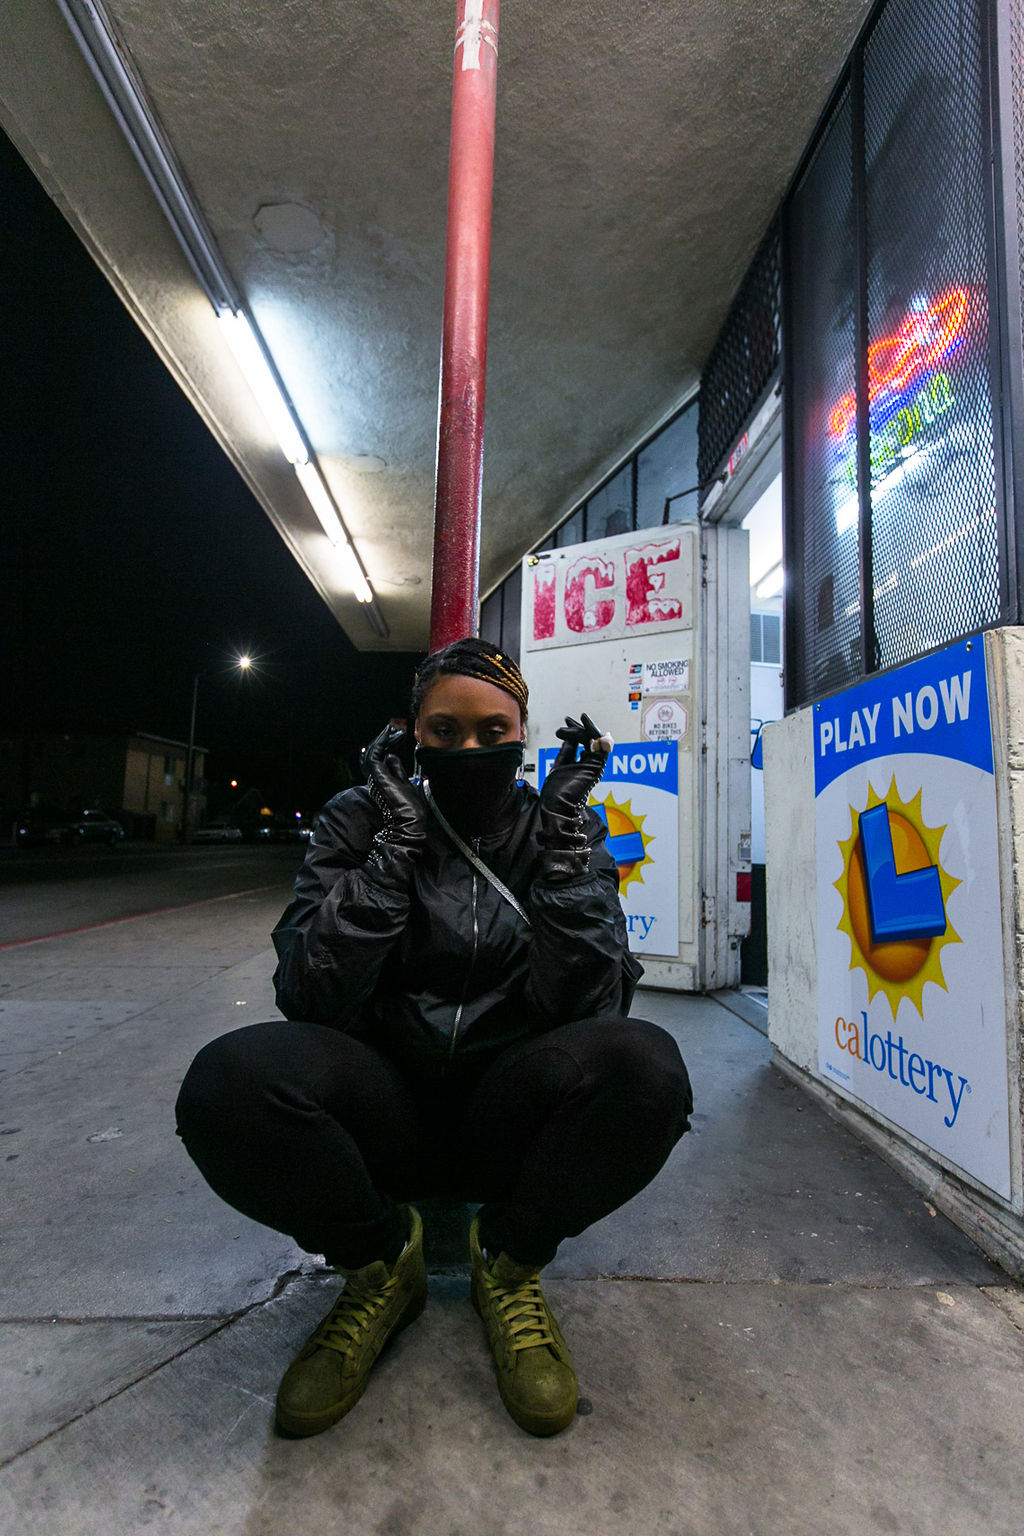 black turtleneck-rsee-xmmtt-lcm-wear who you are-liquor store-night photography-social media hiatus